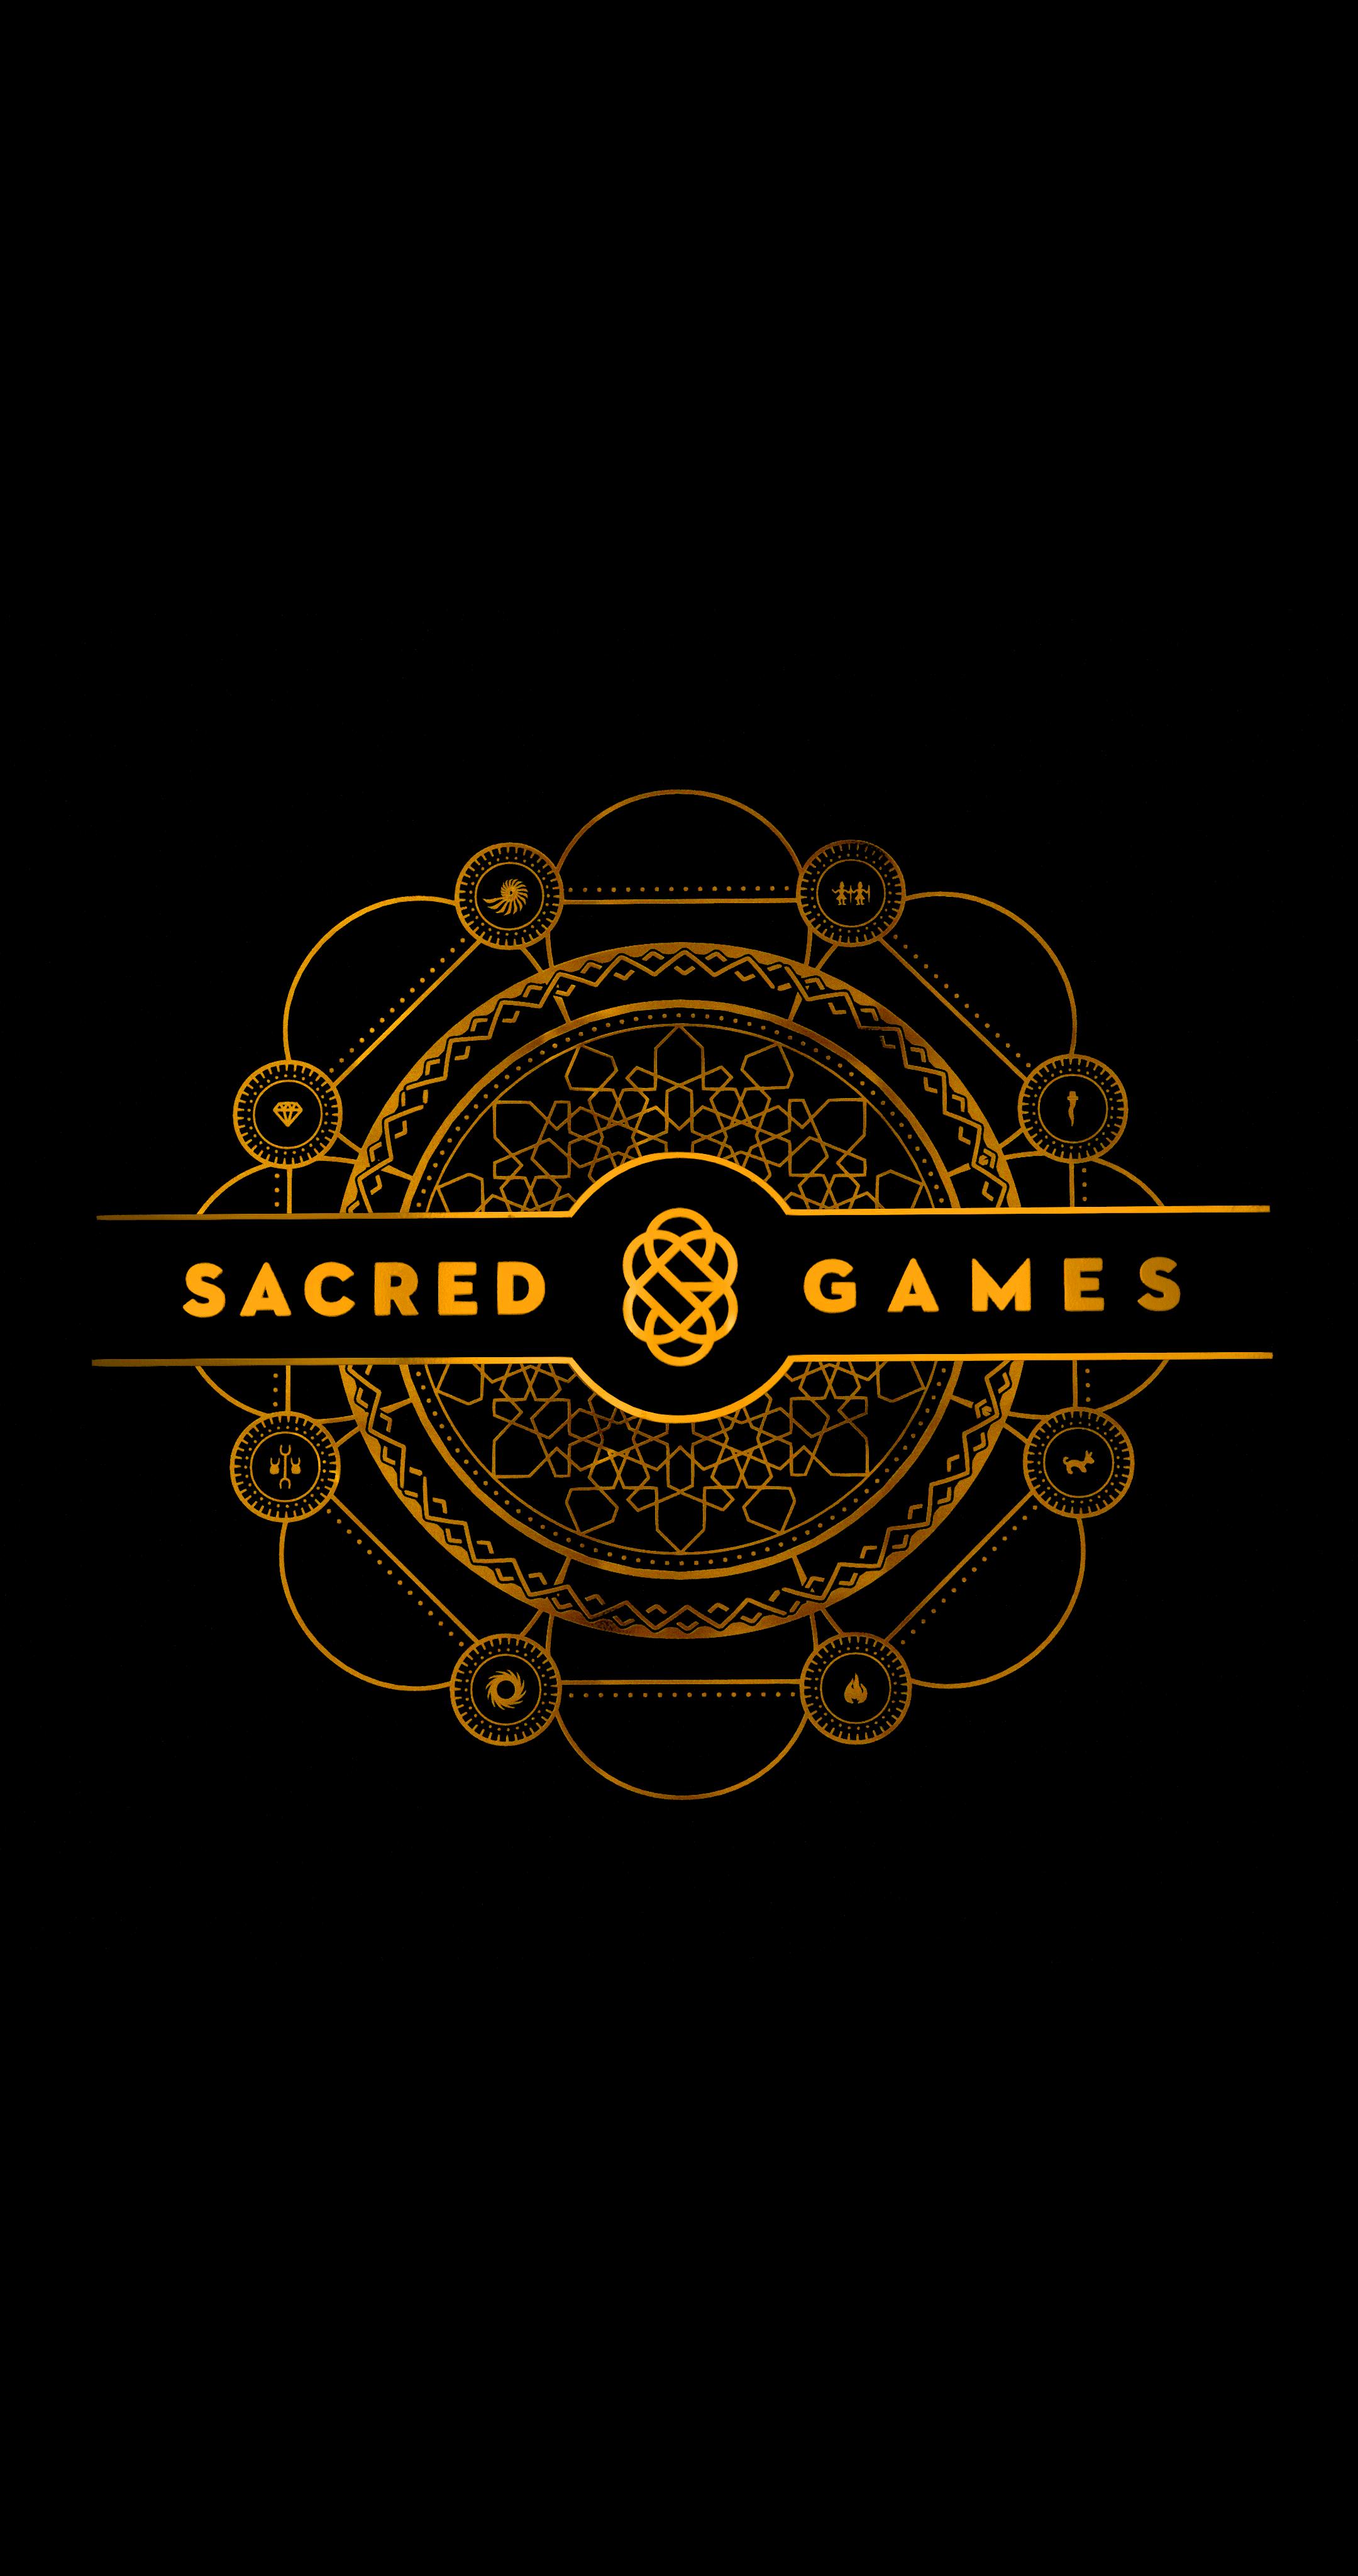 16 Sacred Games Wallpapers On Wallpapersafari